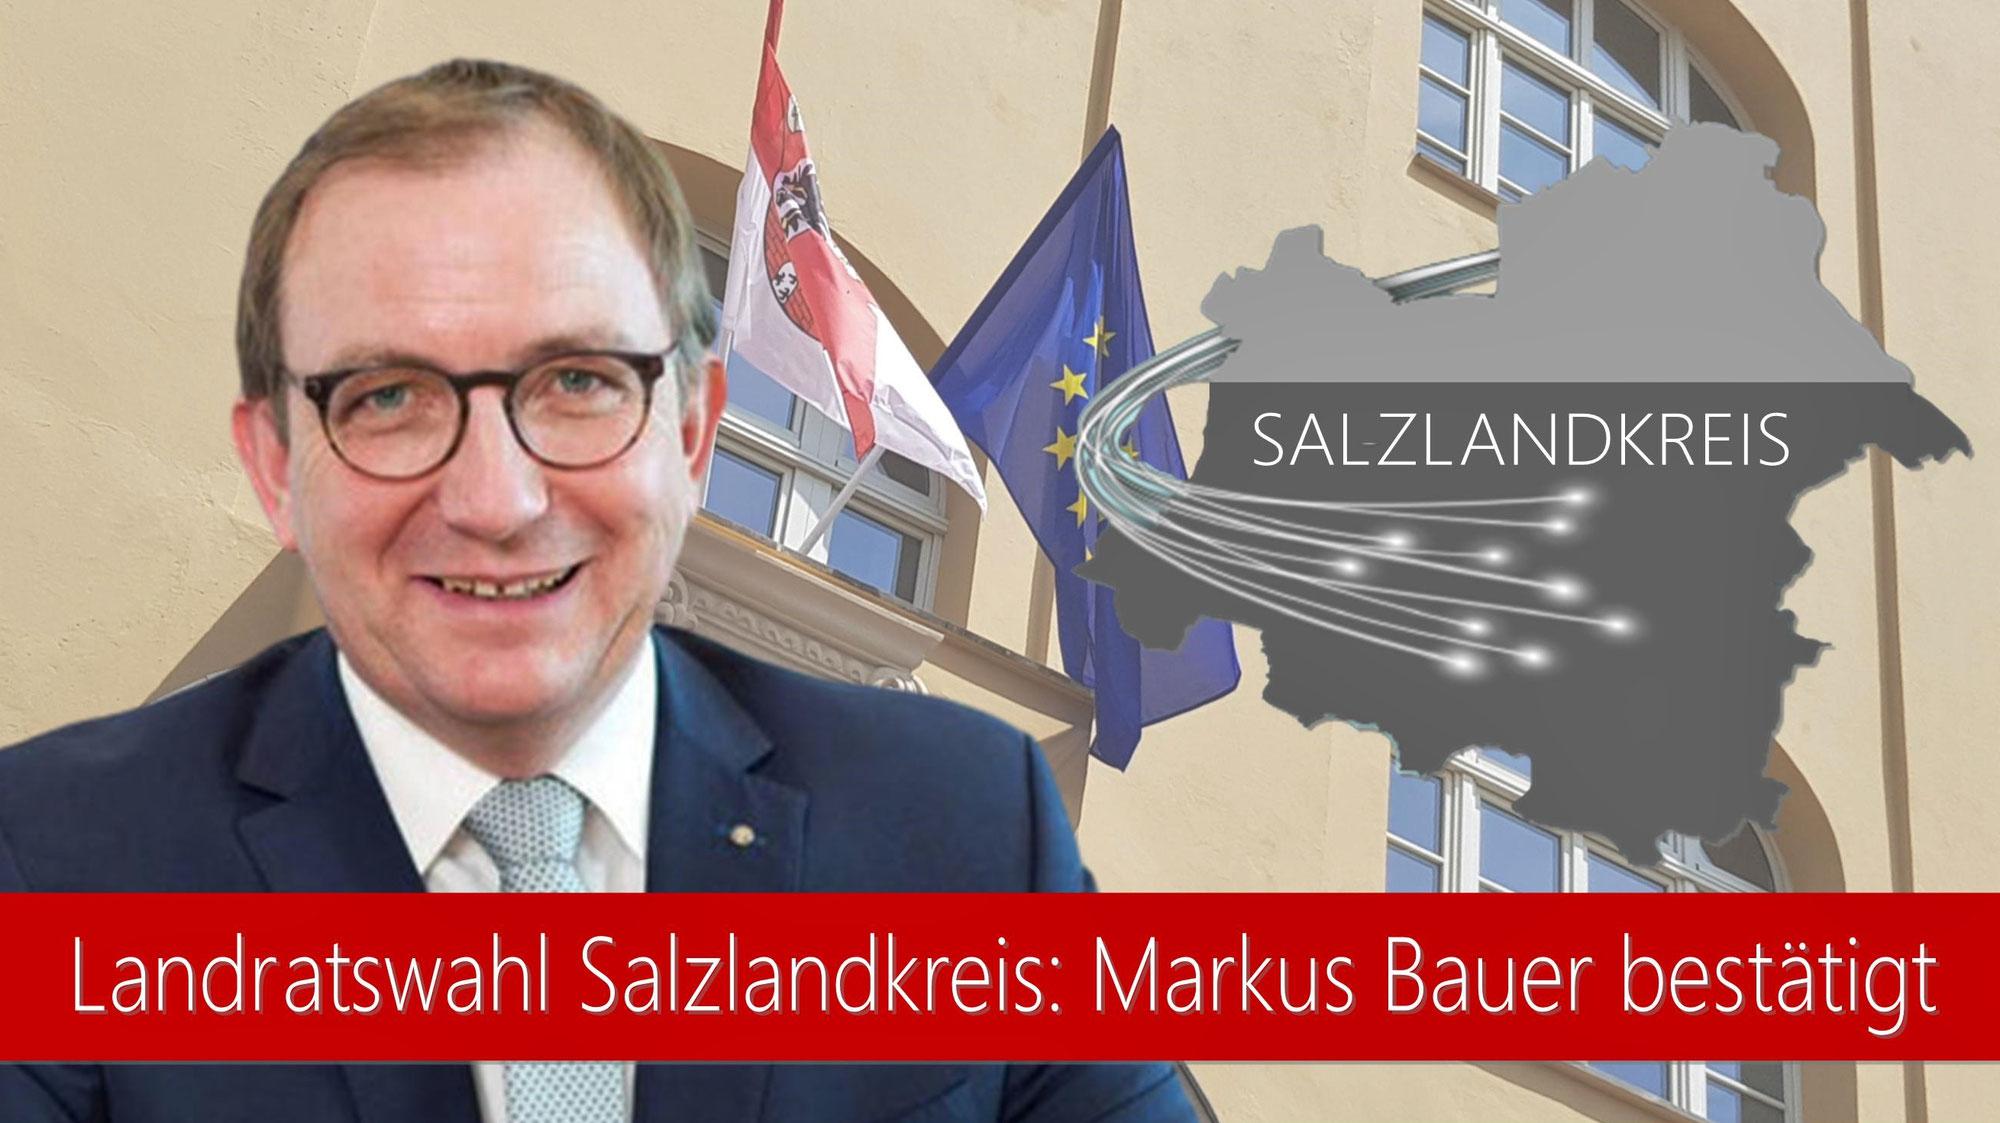 Markus Bauer bleibt Landrat des Salzlandkreises